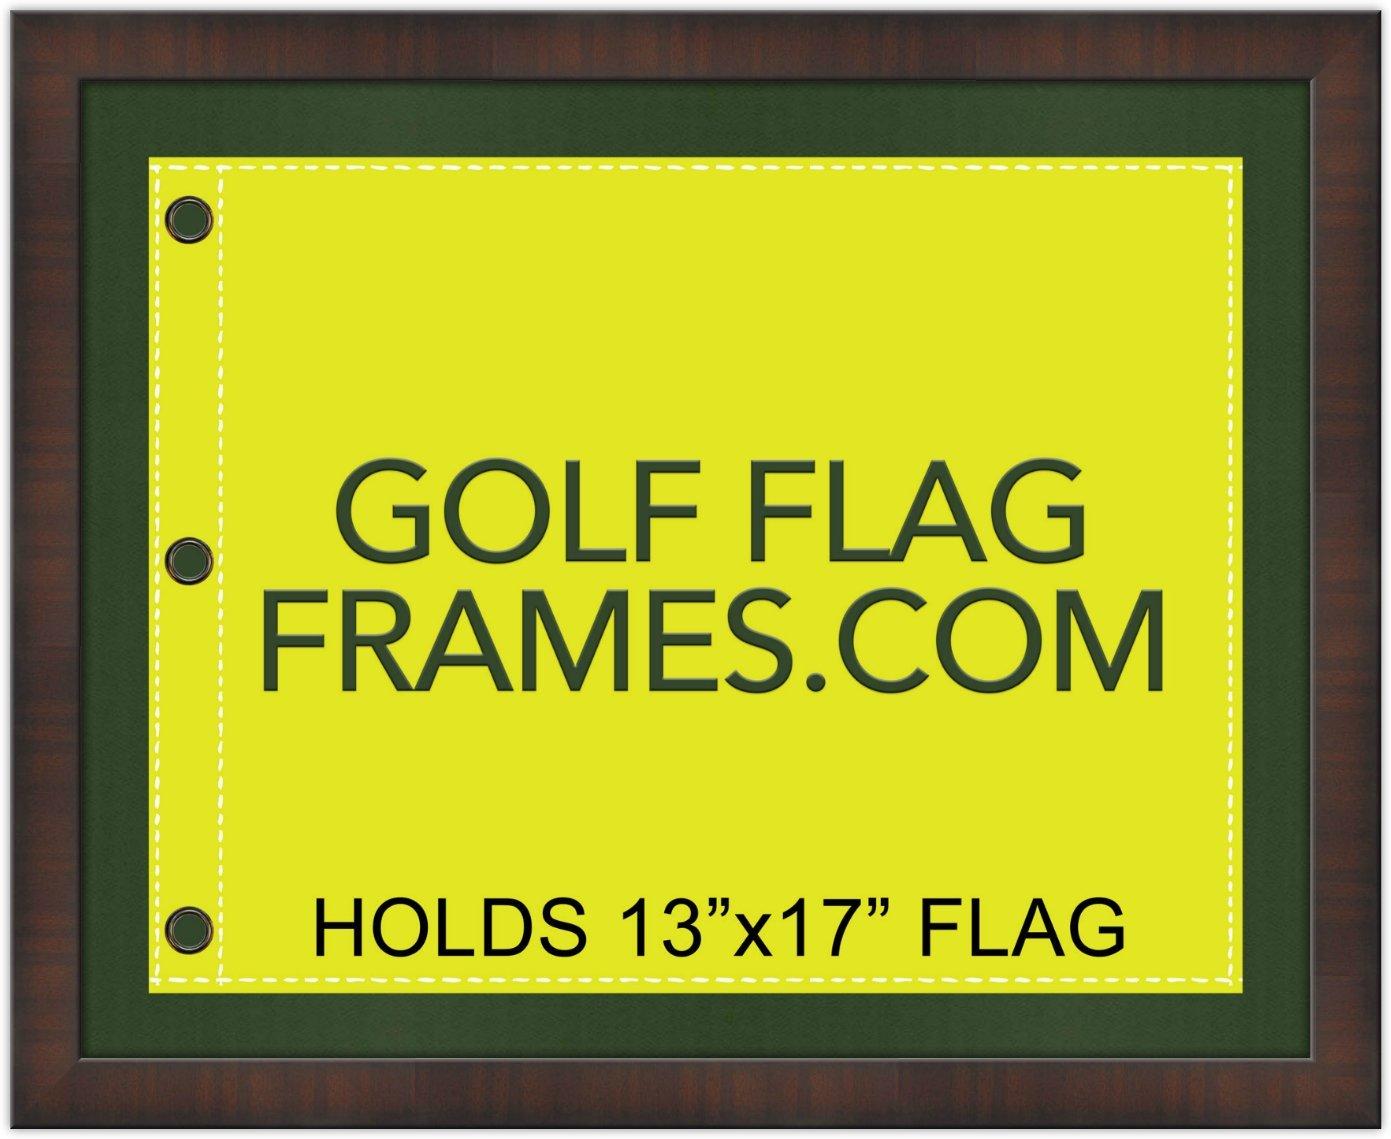 16 x 20 braun Golf Flagge Rahmen, Zierleiste brn-001, grün matte ...